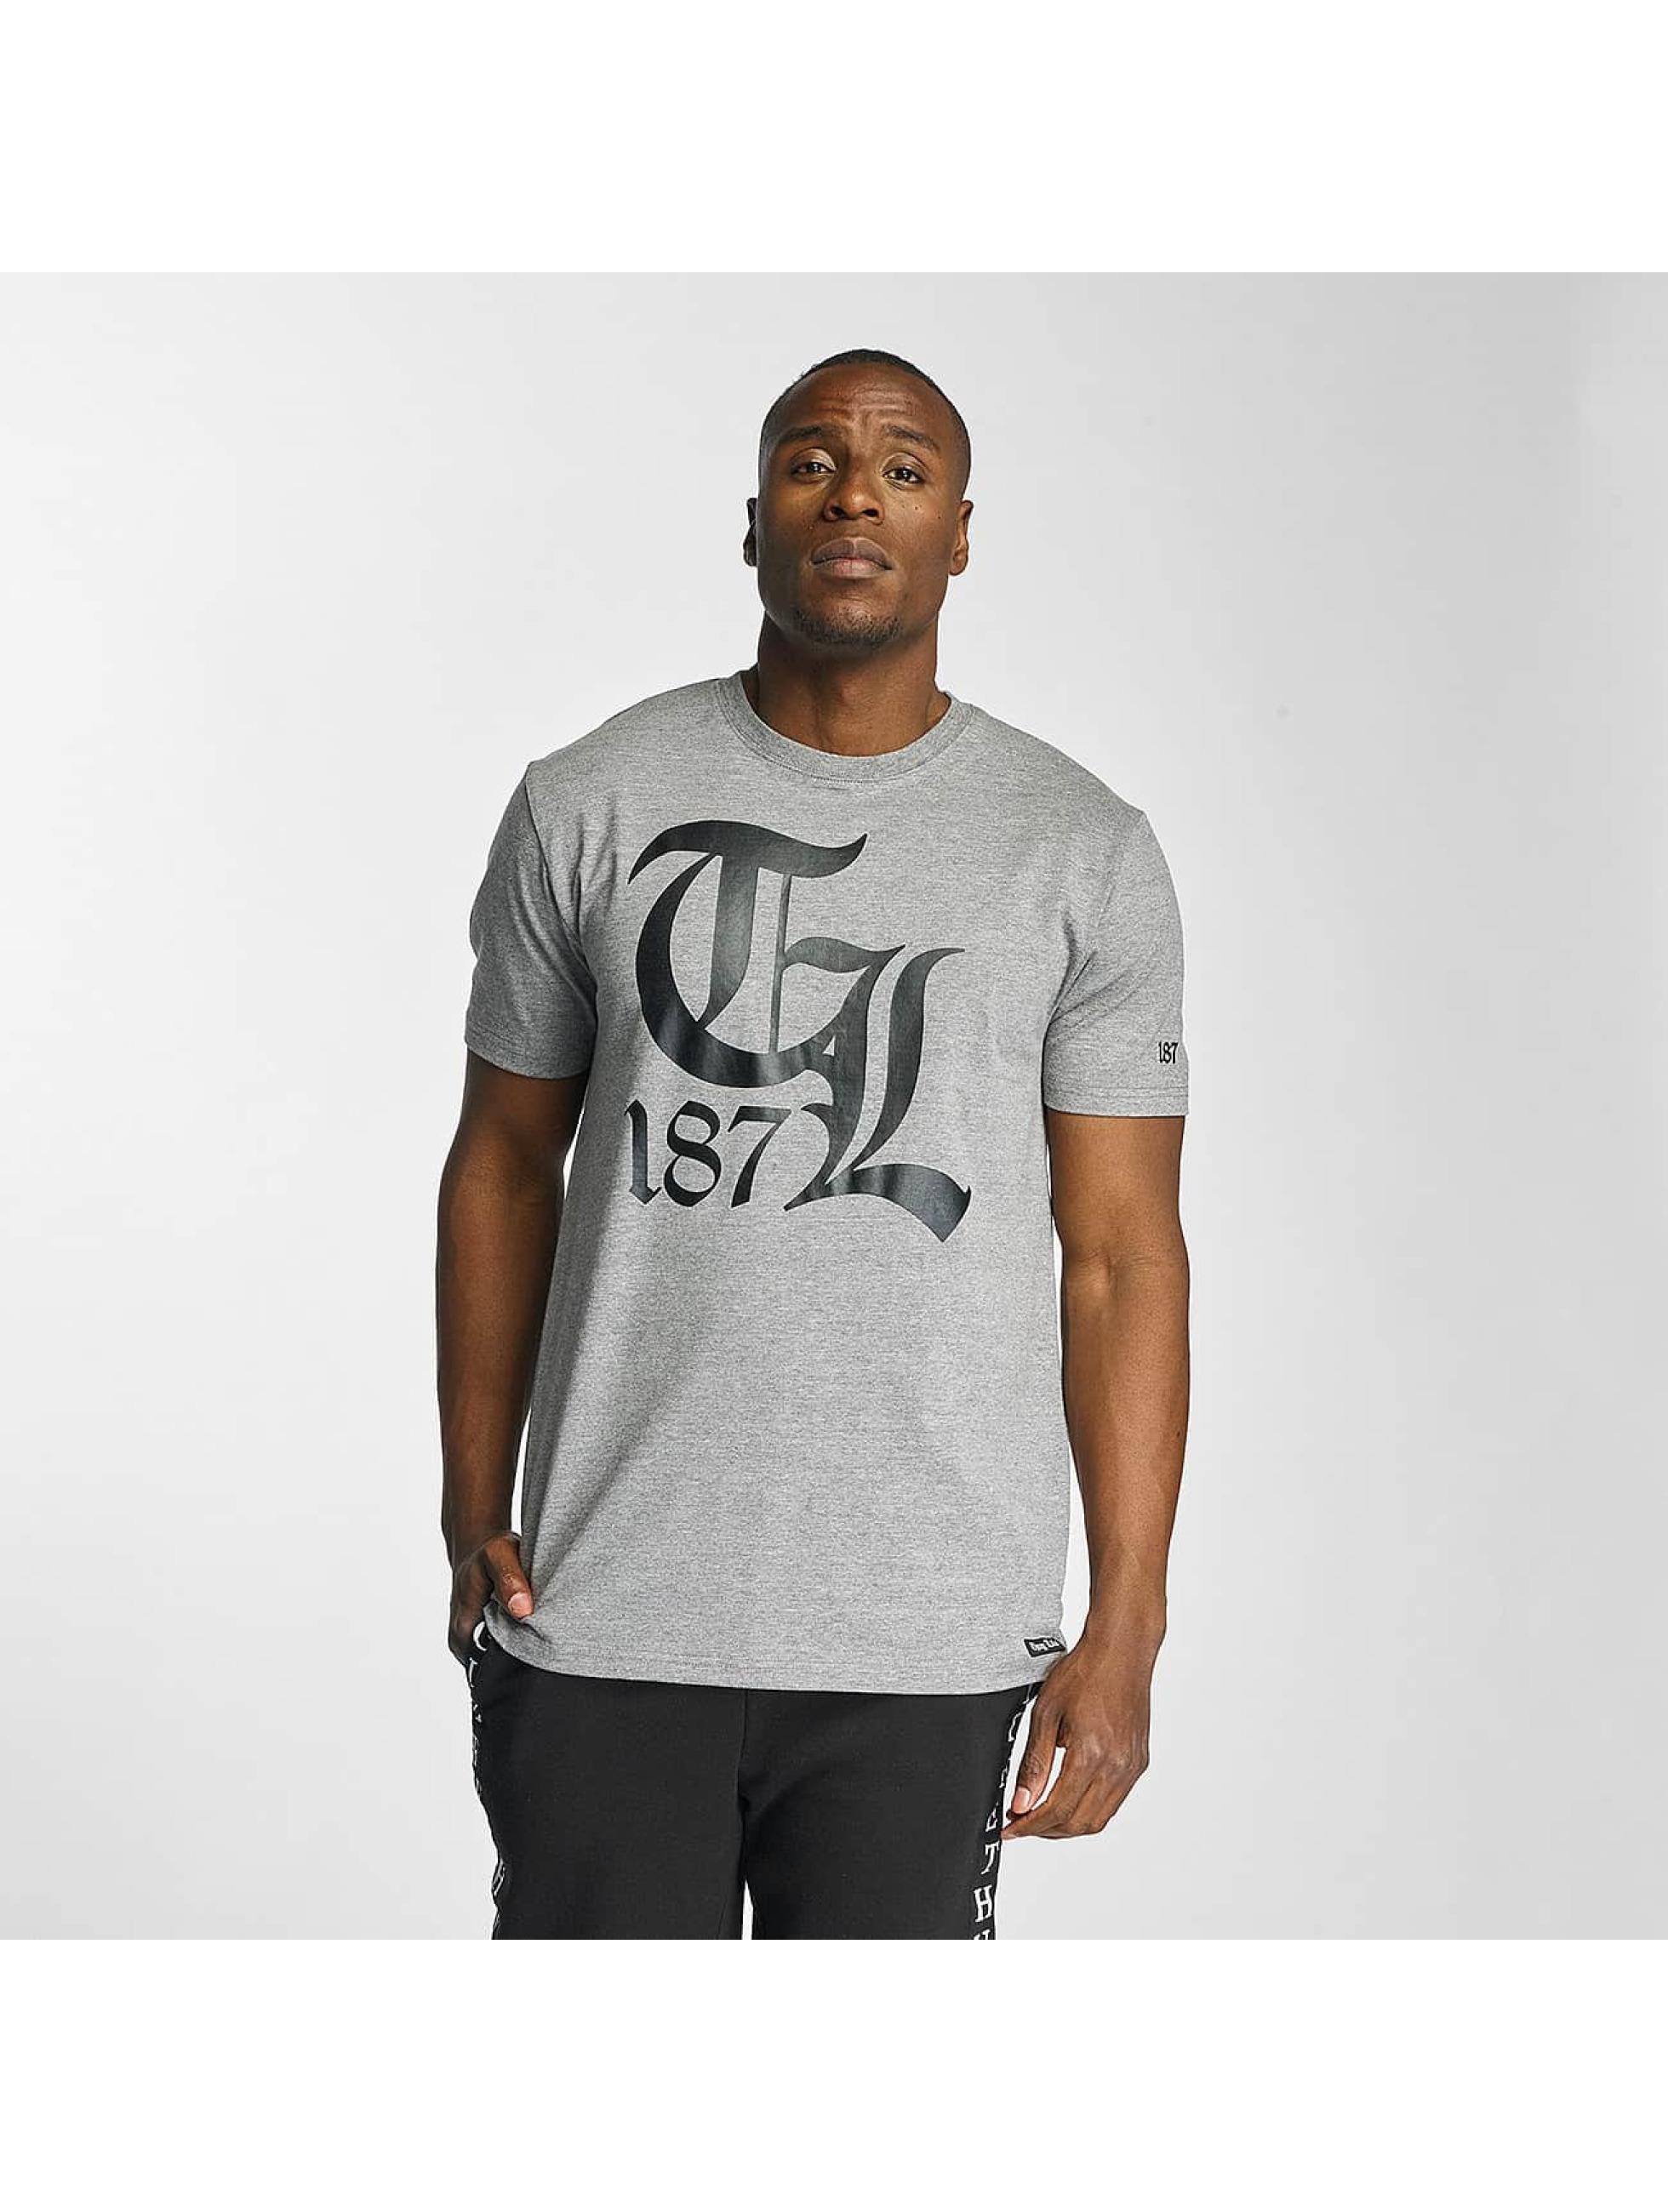 Thug Life / T-Shirt Mellow in grey 2XL